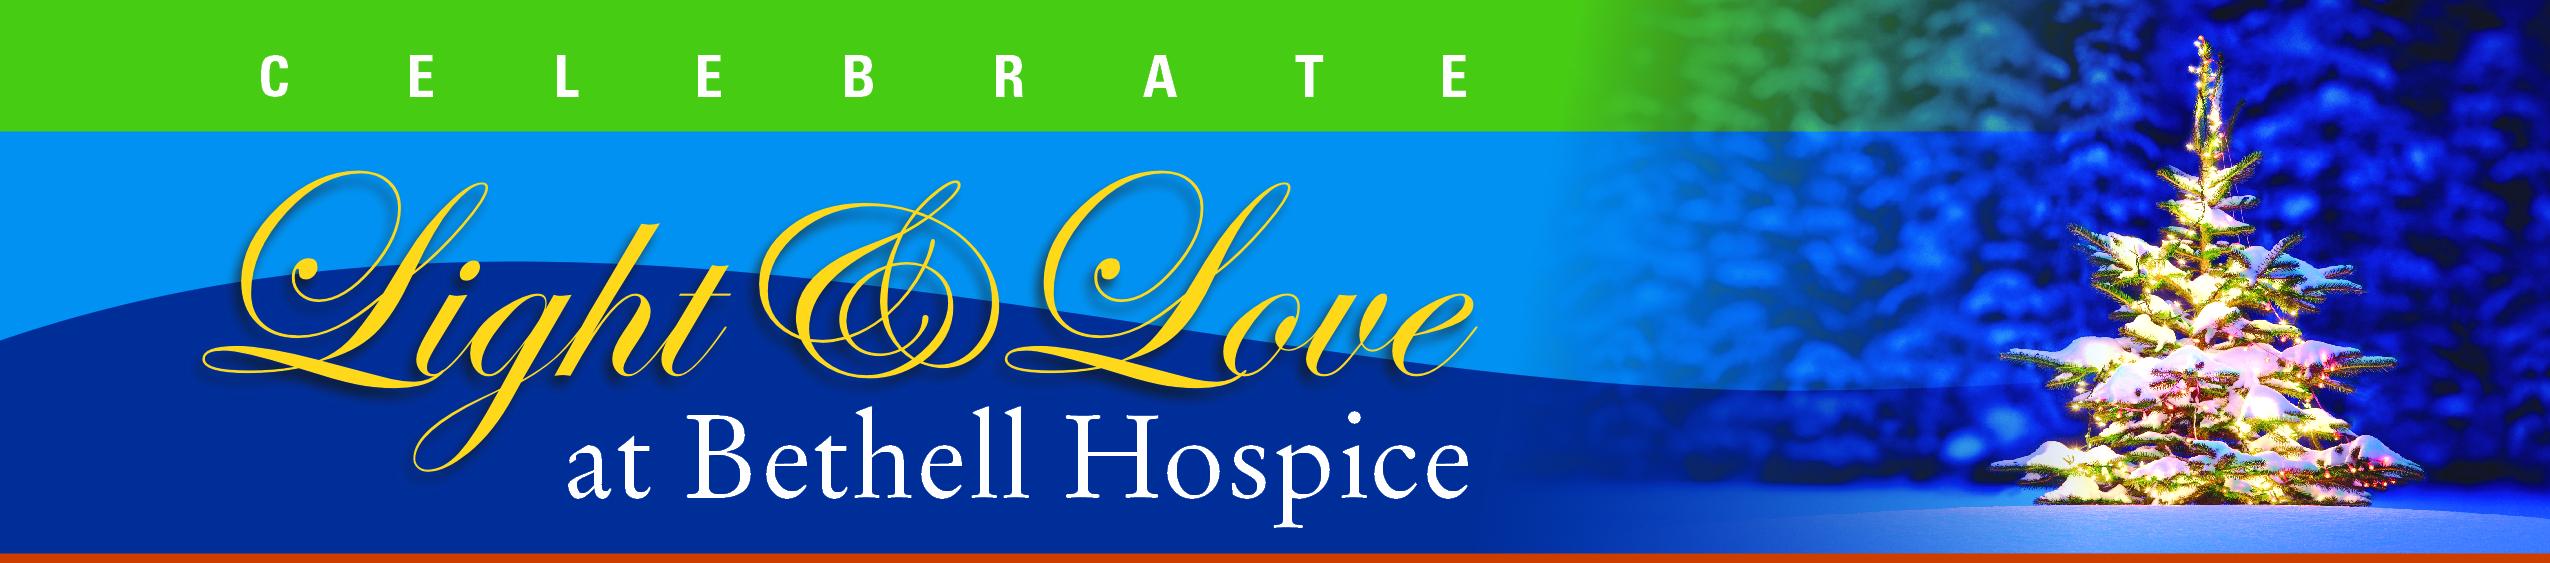 Bethell Hospice Holiday Appeal Masthead